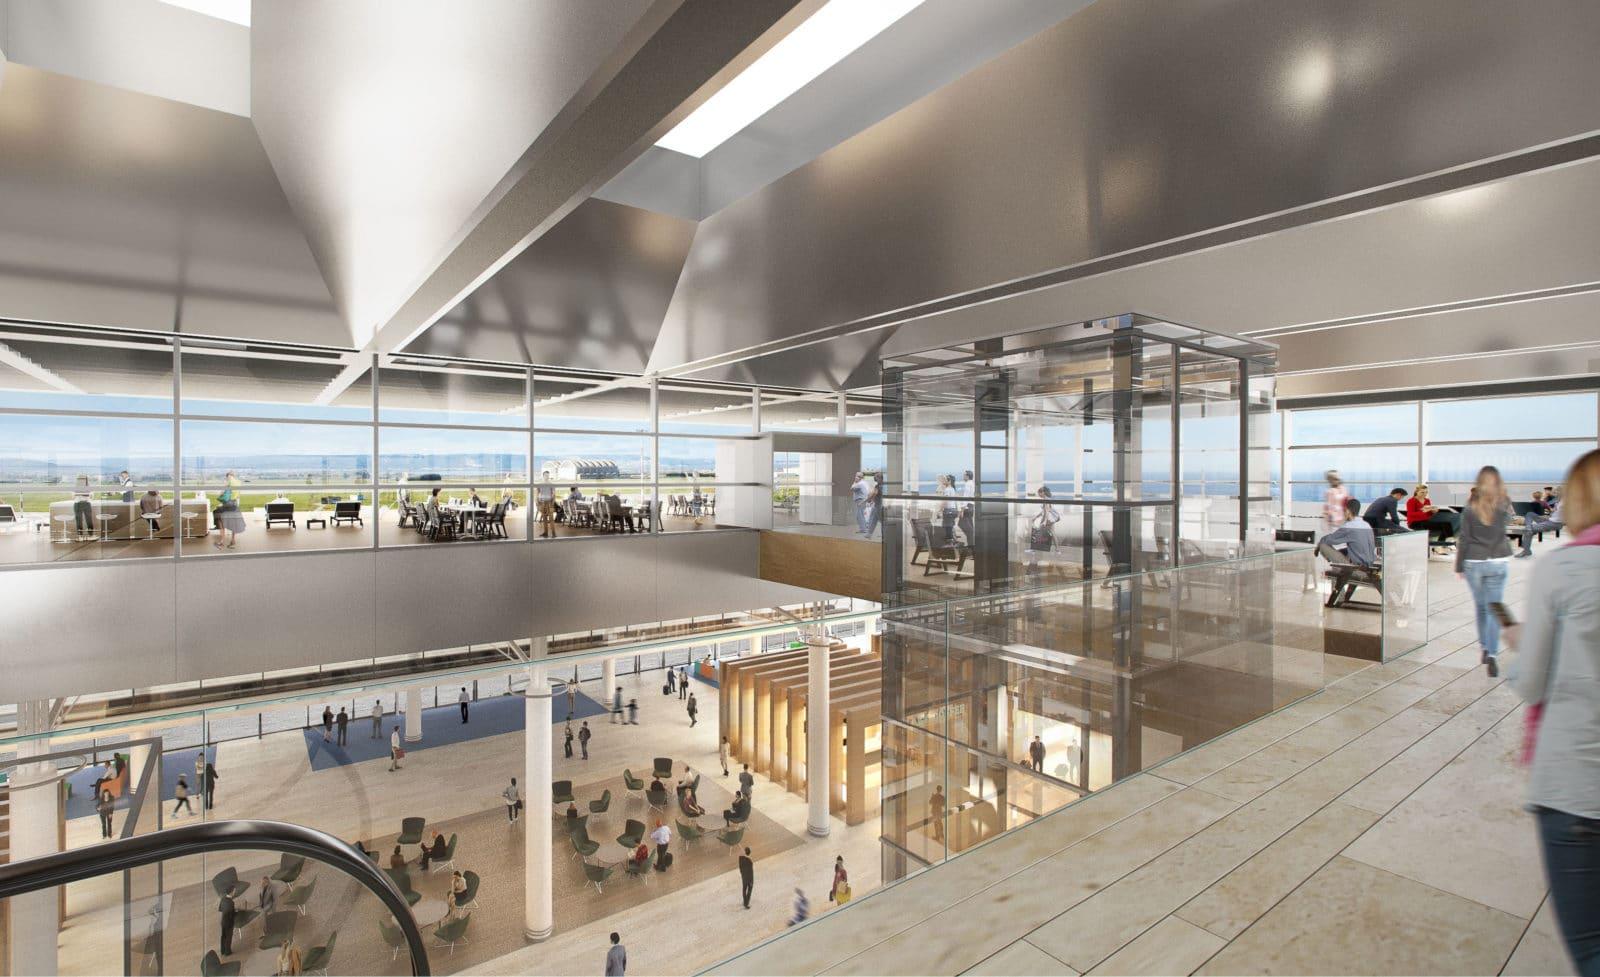 aeroport marseille extension foster 11